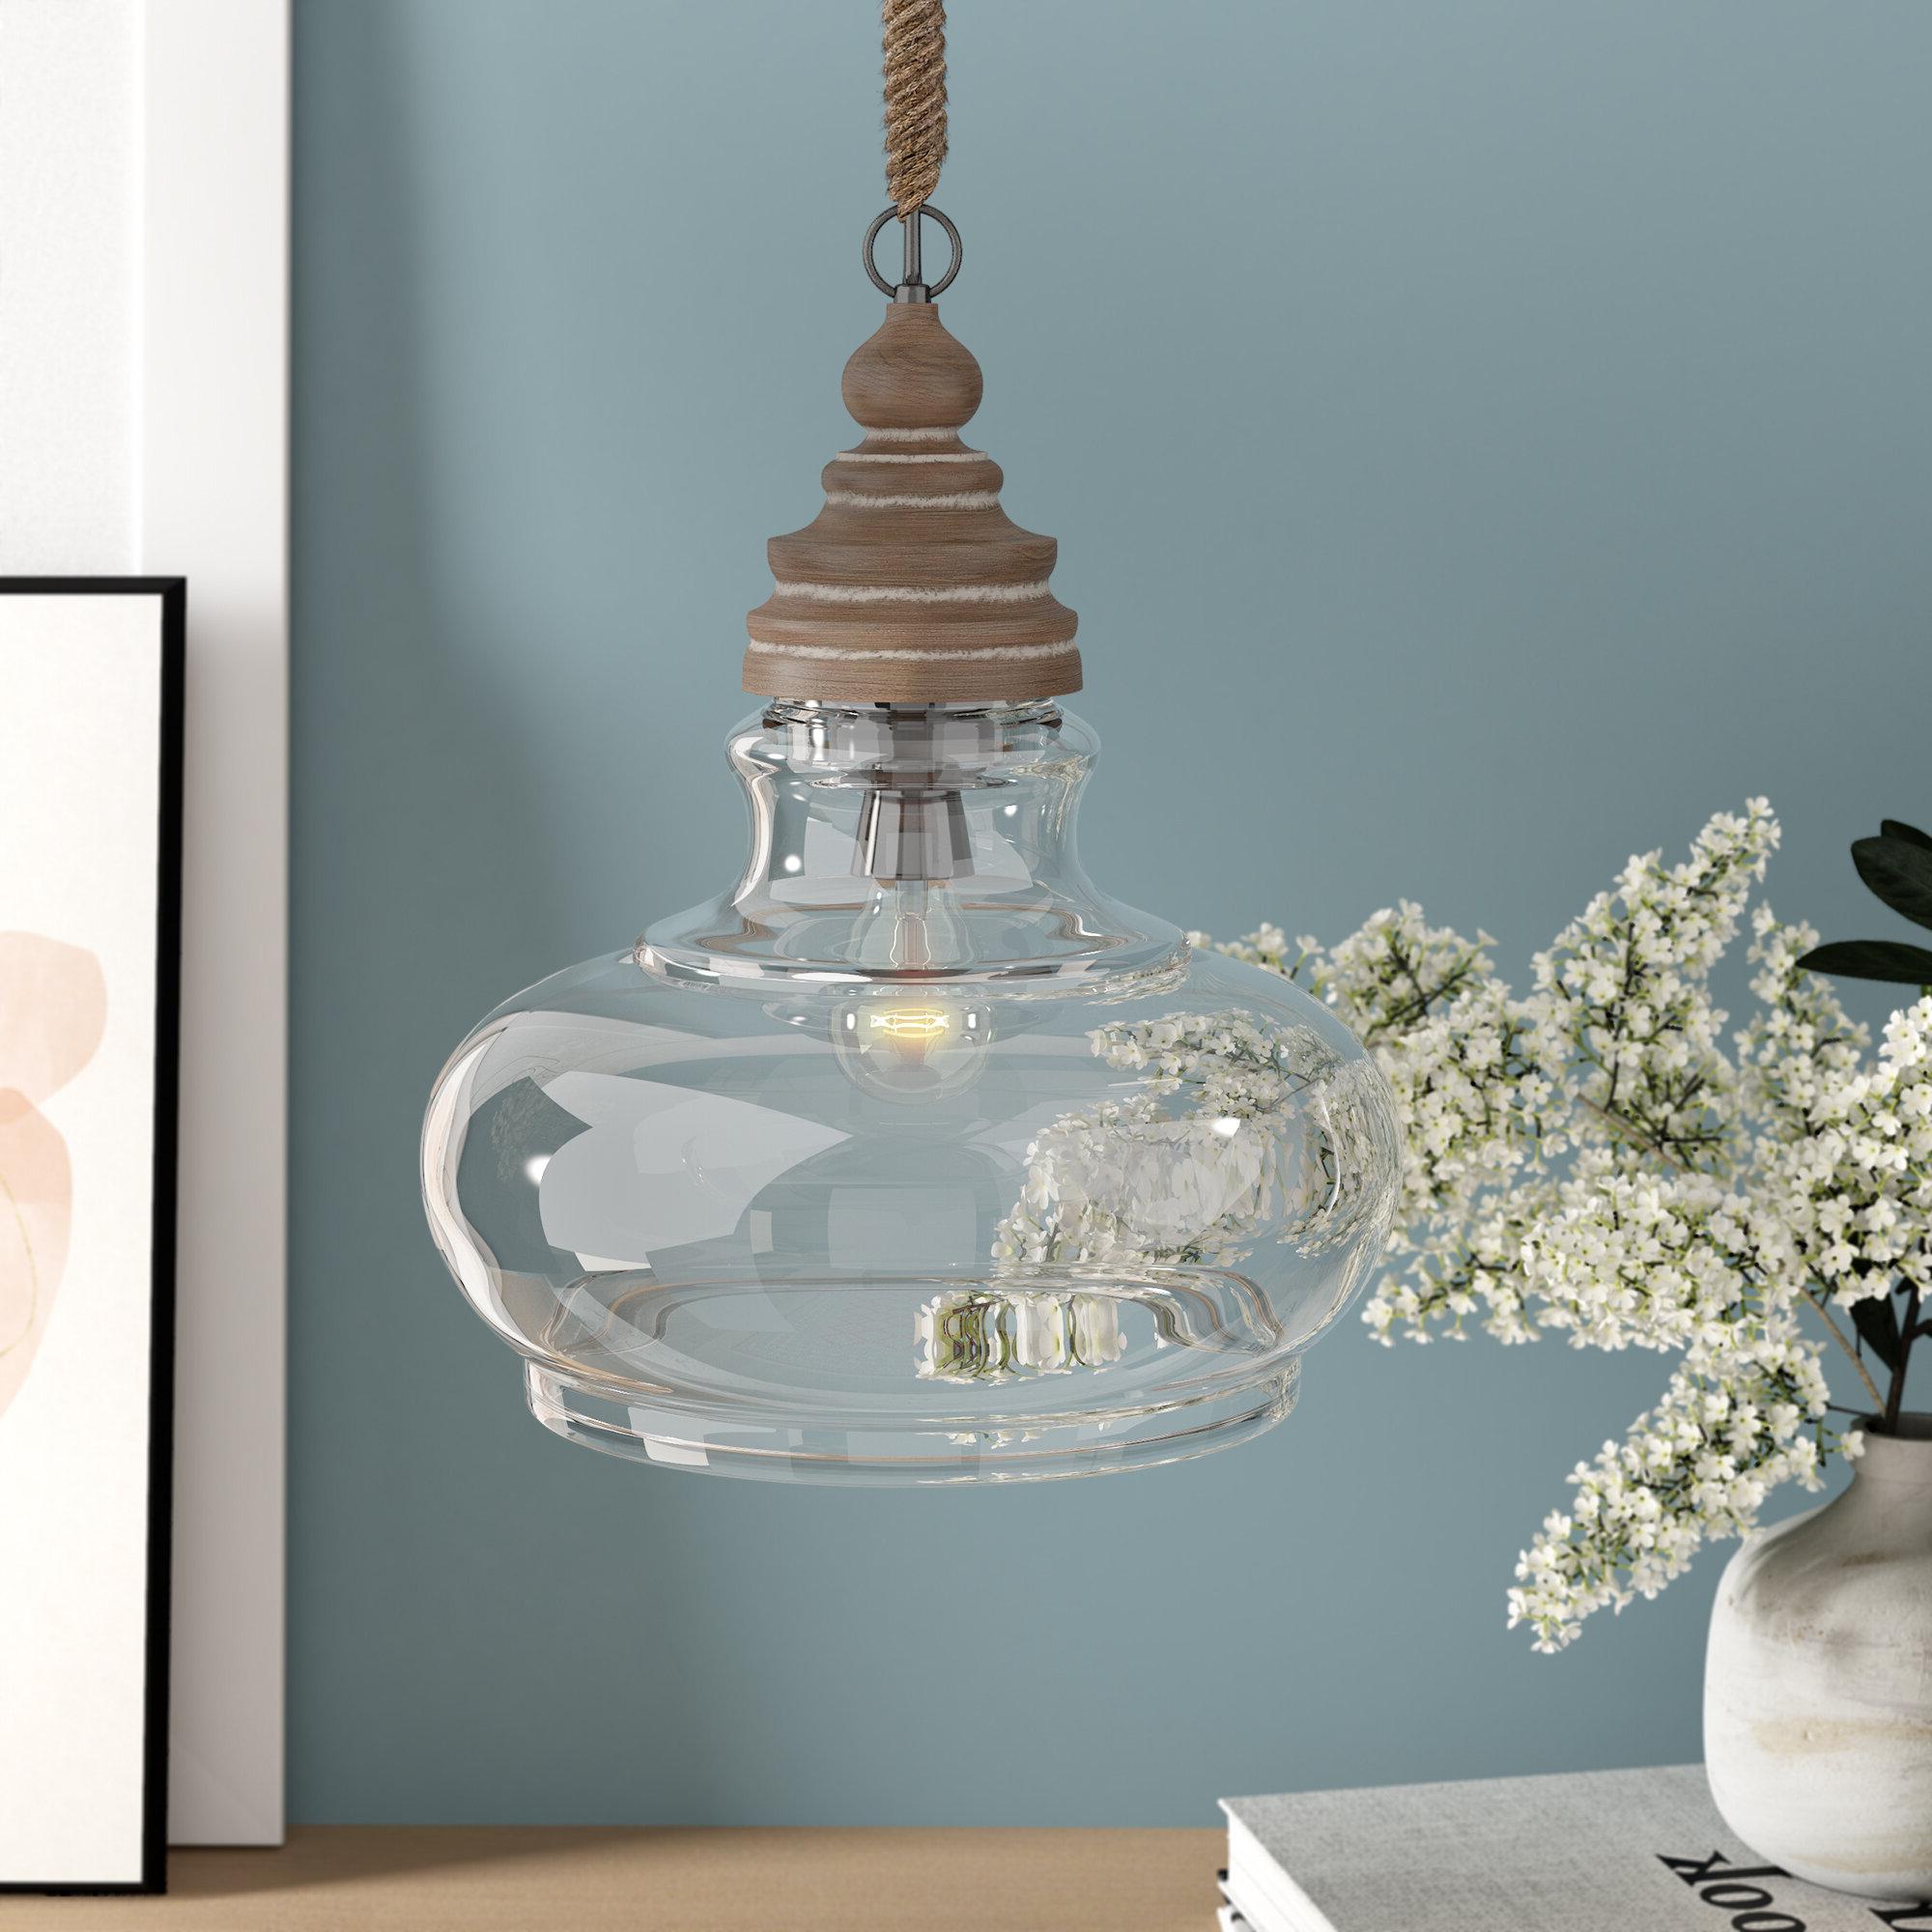 Laurel Foundry Modern Farmhouse Maelle 1 Light Single Bell Pendant Within 2019 Carey 1 Light Single Bell Pendants (View 10 of 20)